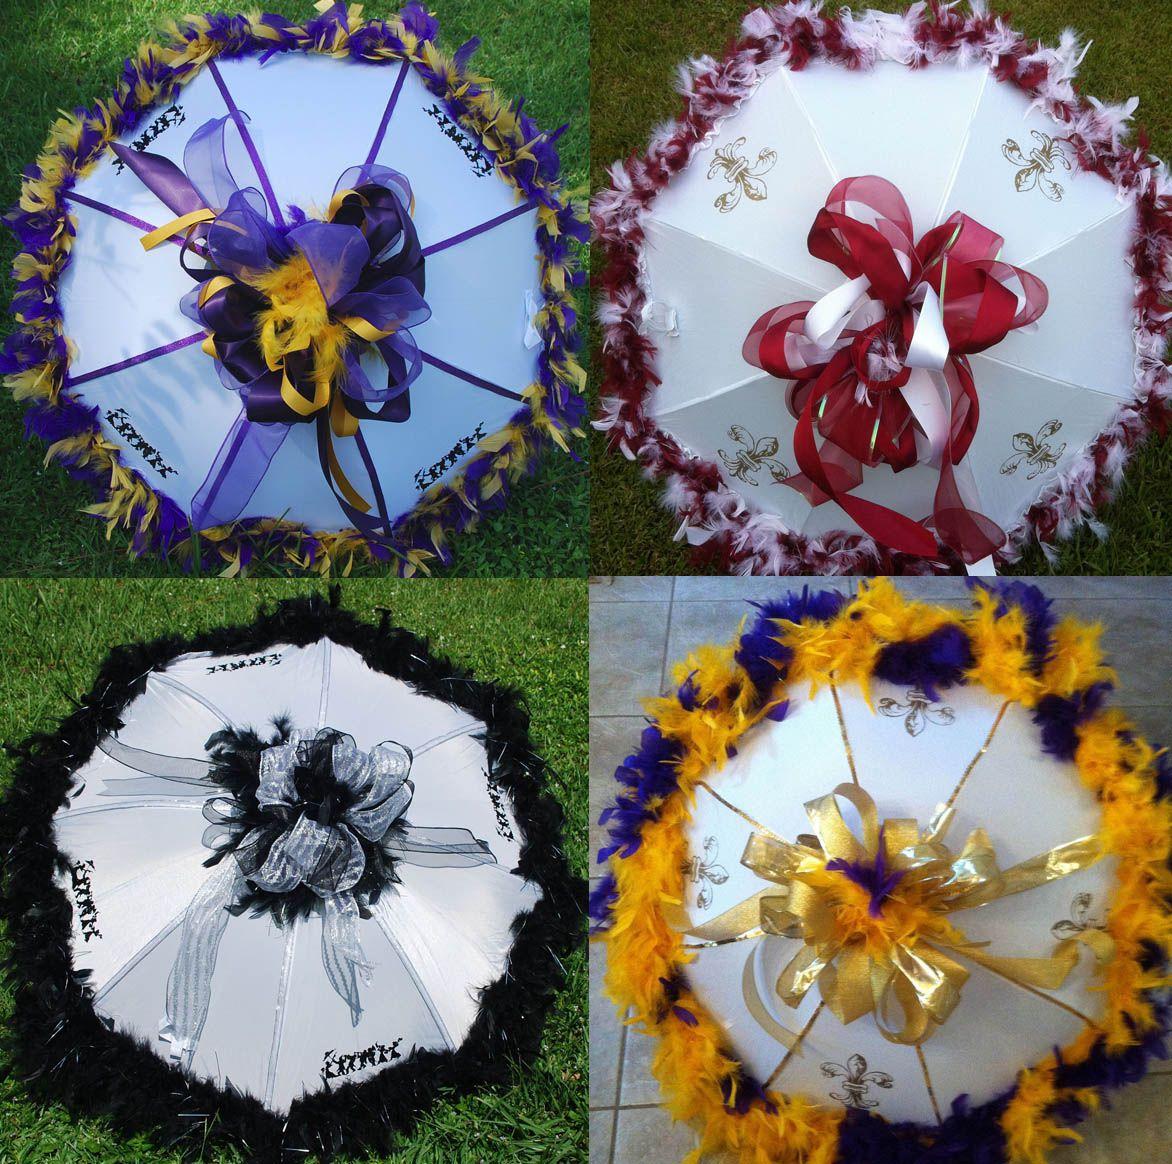 Mardi Gras Wedding Ideas: Pin By Debbie Maxey On Mardi Gras - Umbrella